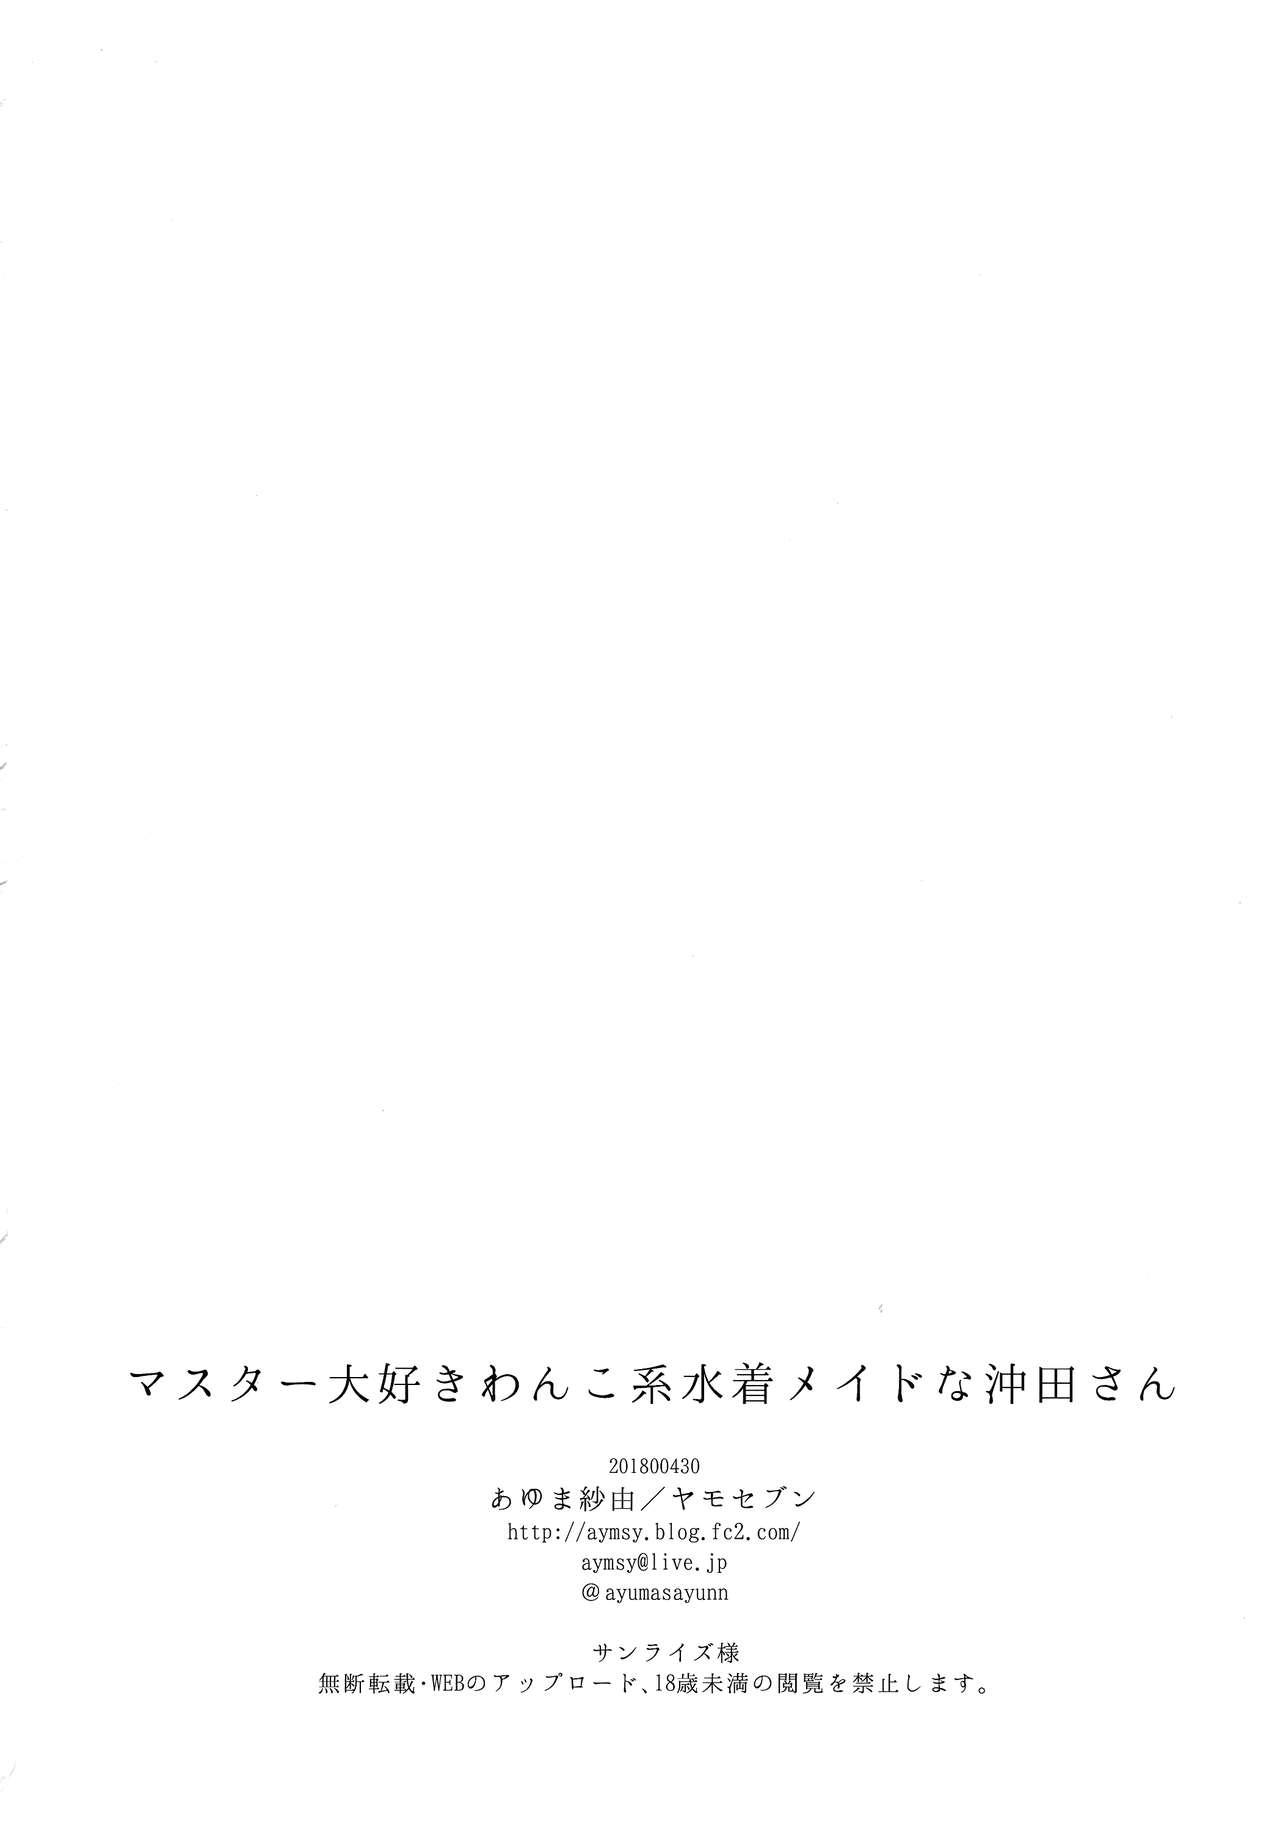 (COMIC1☆13) [Yamo7 (Ayuma Sayu)] Master Daisuki Wanko-kei Mizugi Maid na Okita-san   Dog-type Swimsuit Maid Okita who loves Master (Fate/Grand Order) [English] 18